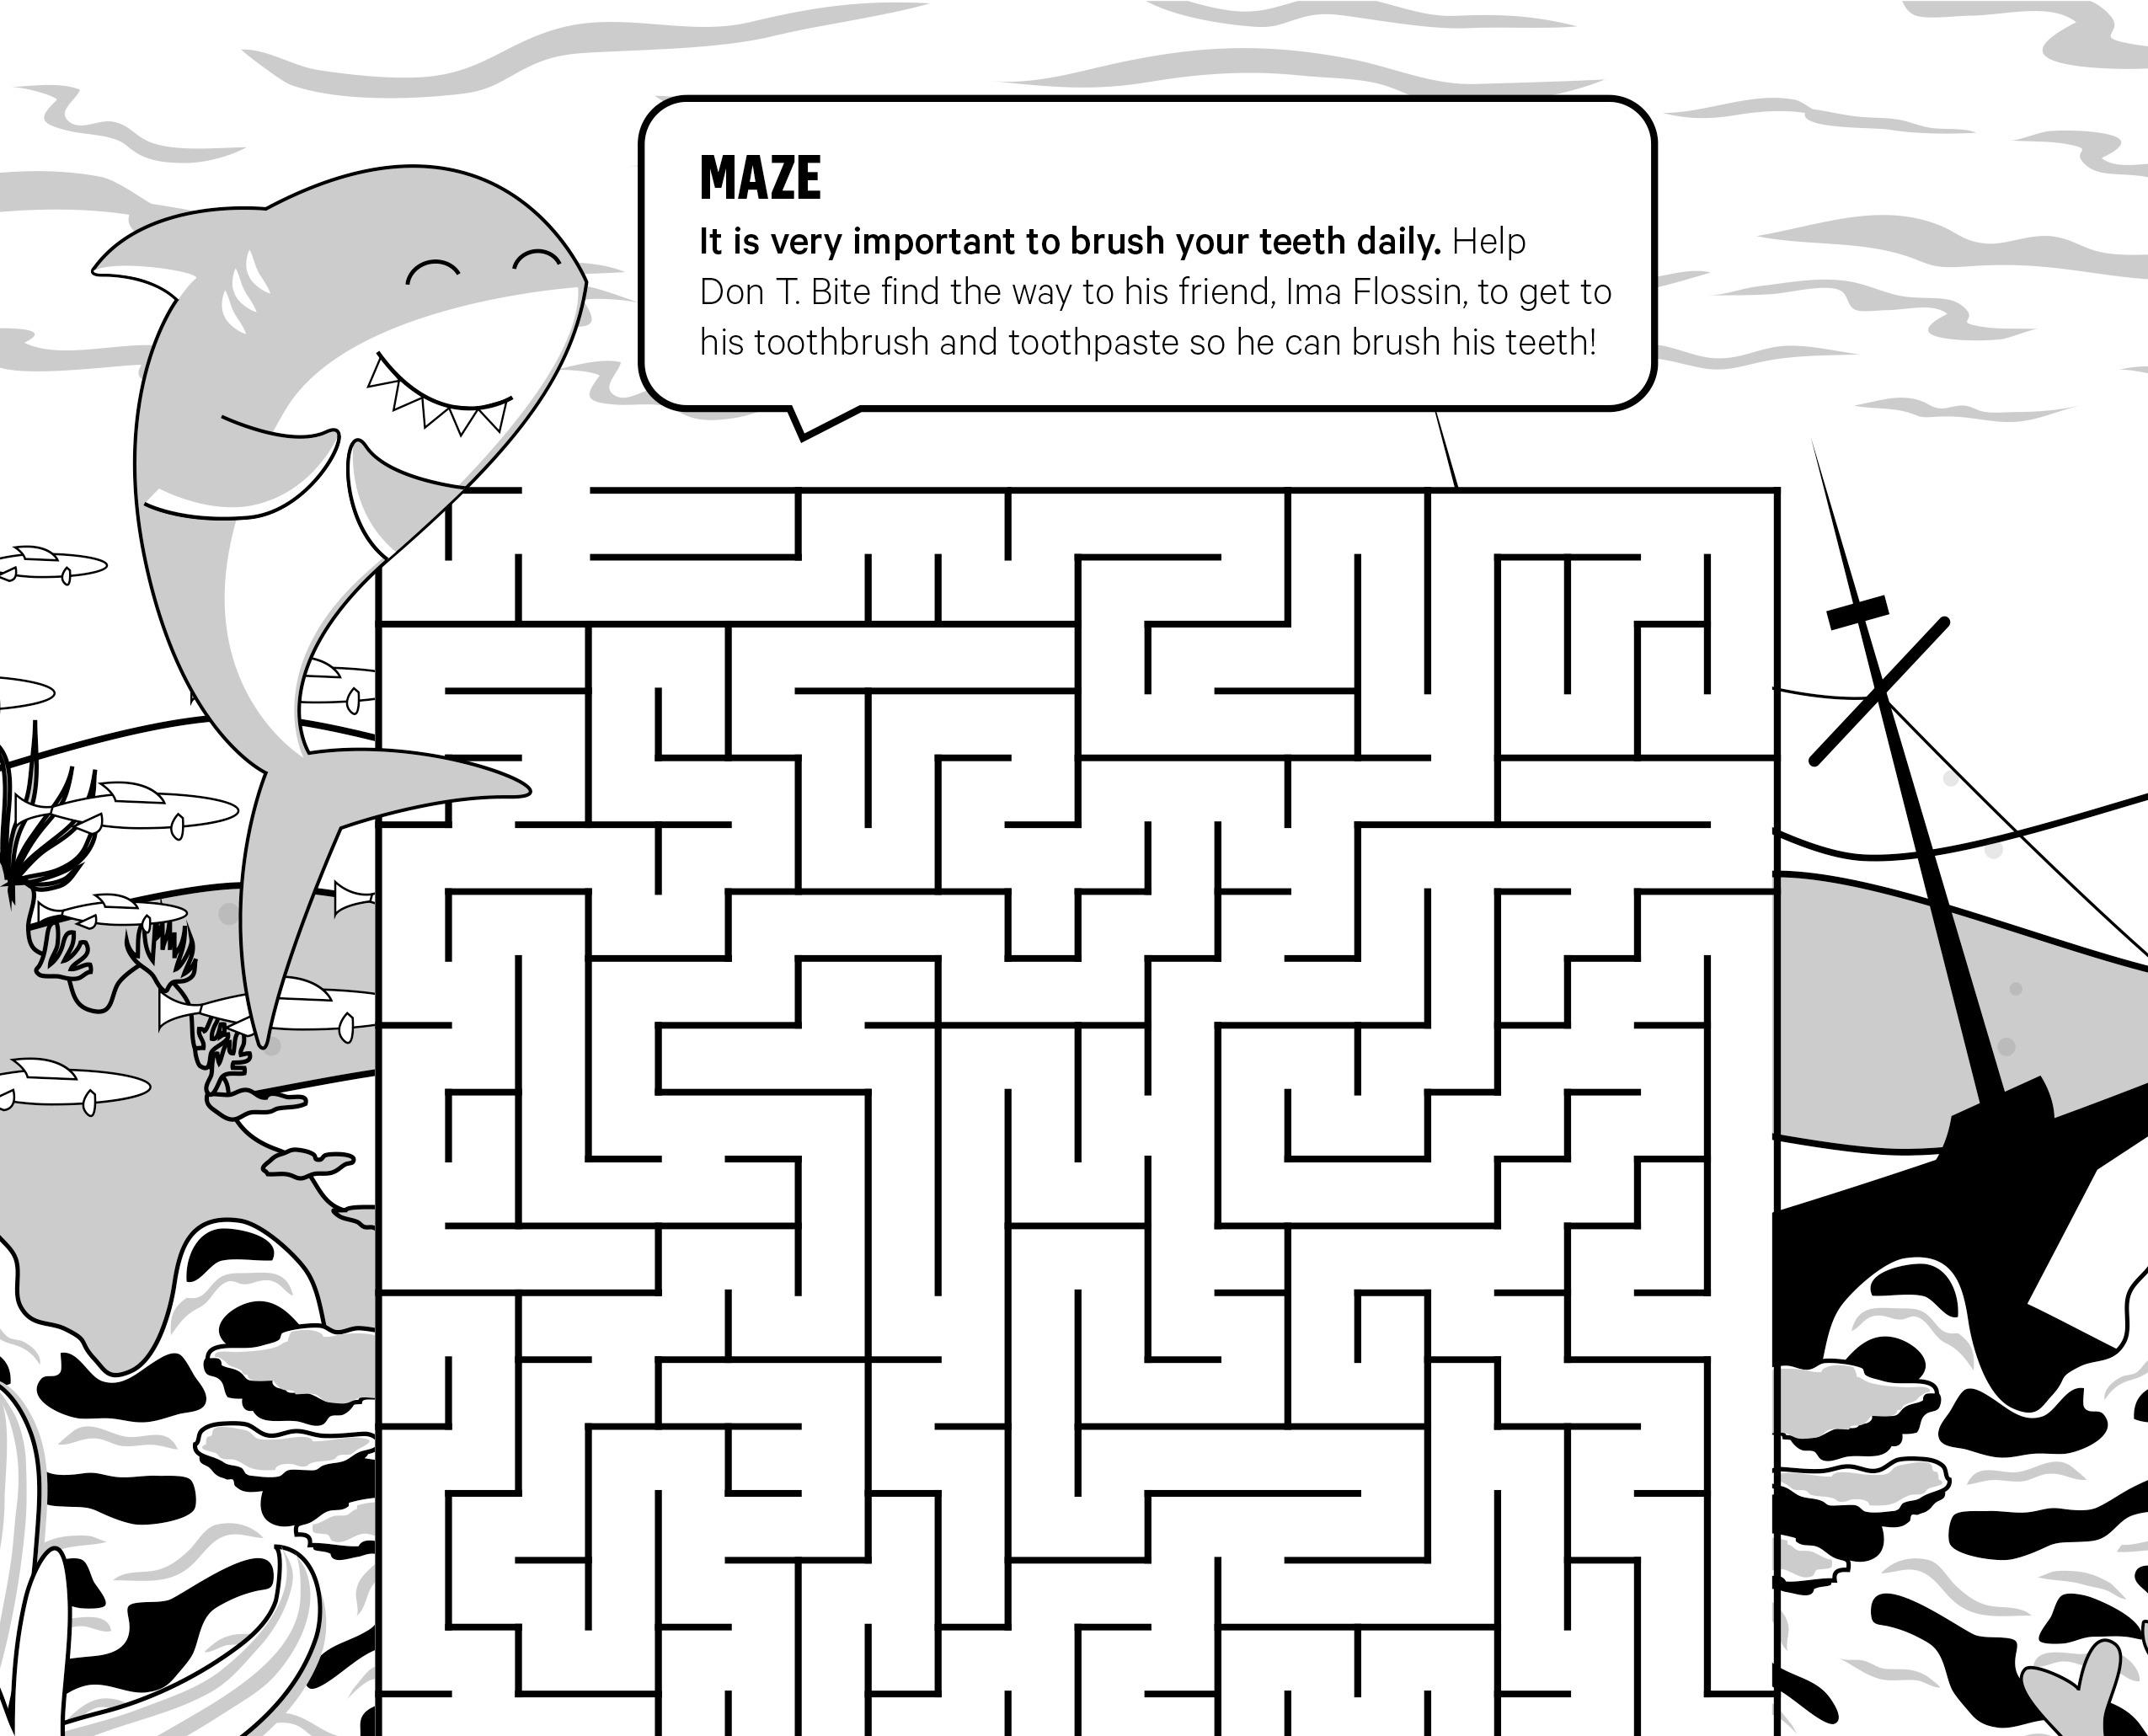 Kids' Smile Zone Maze